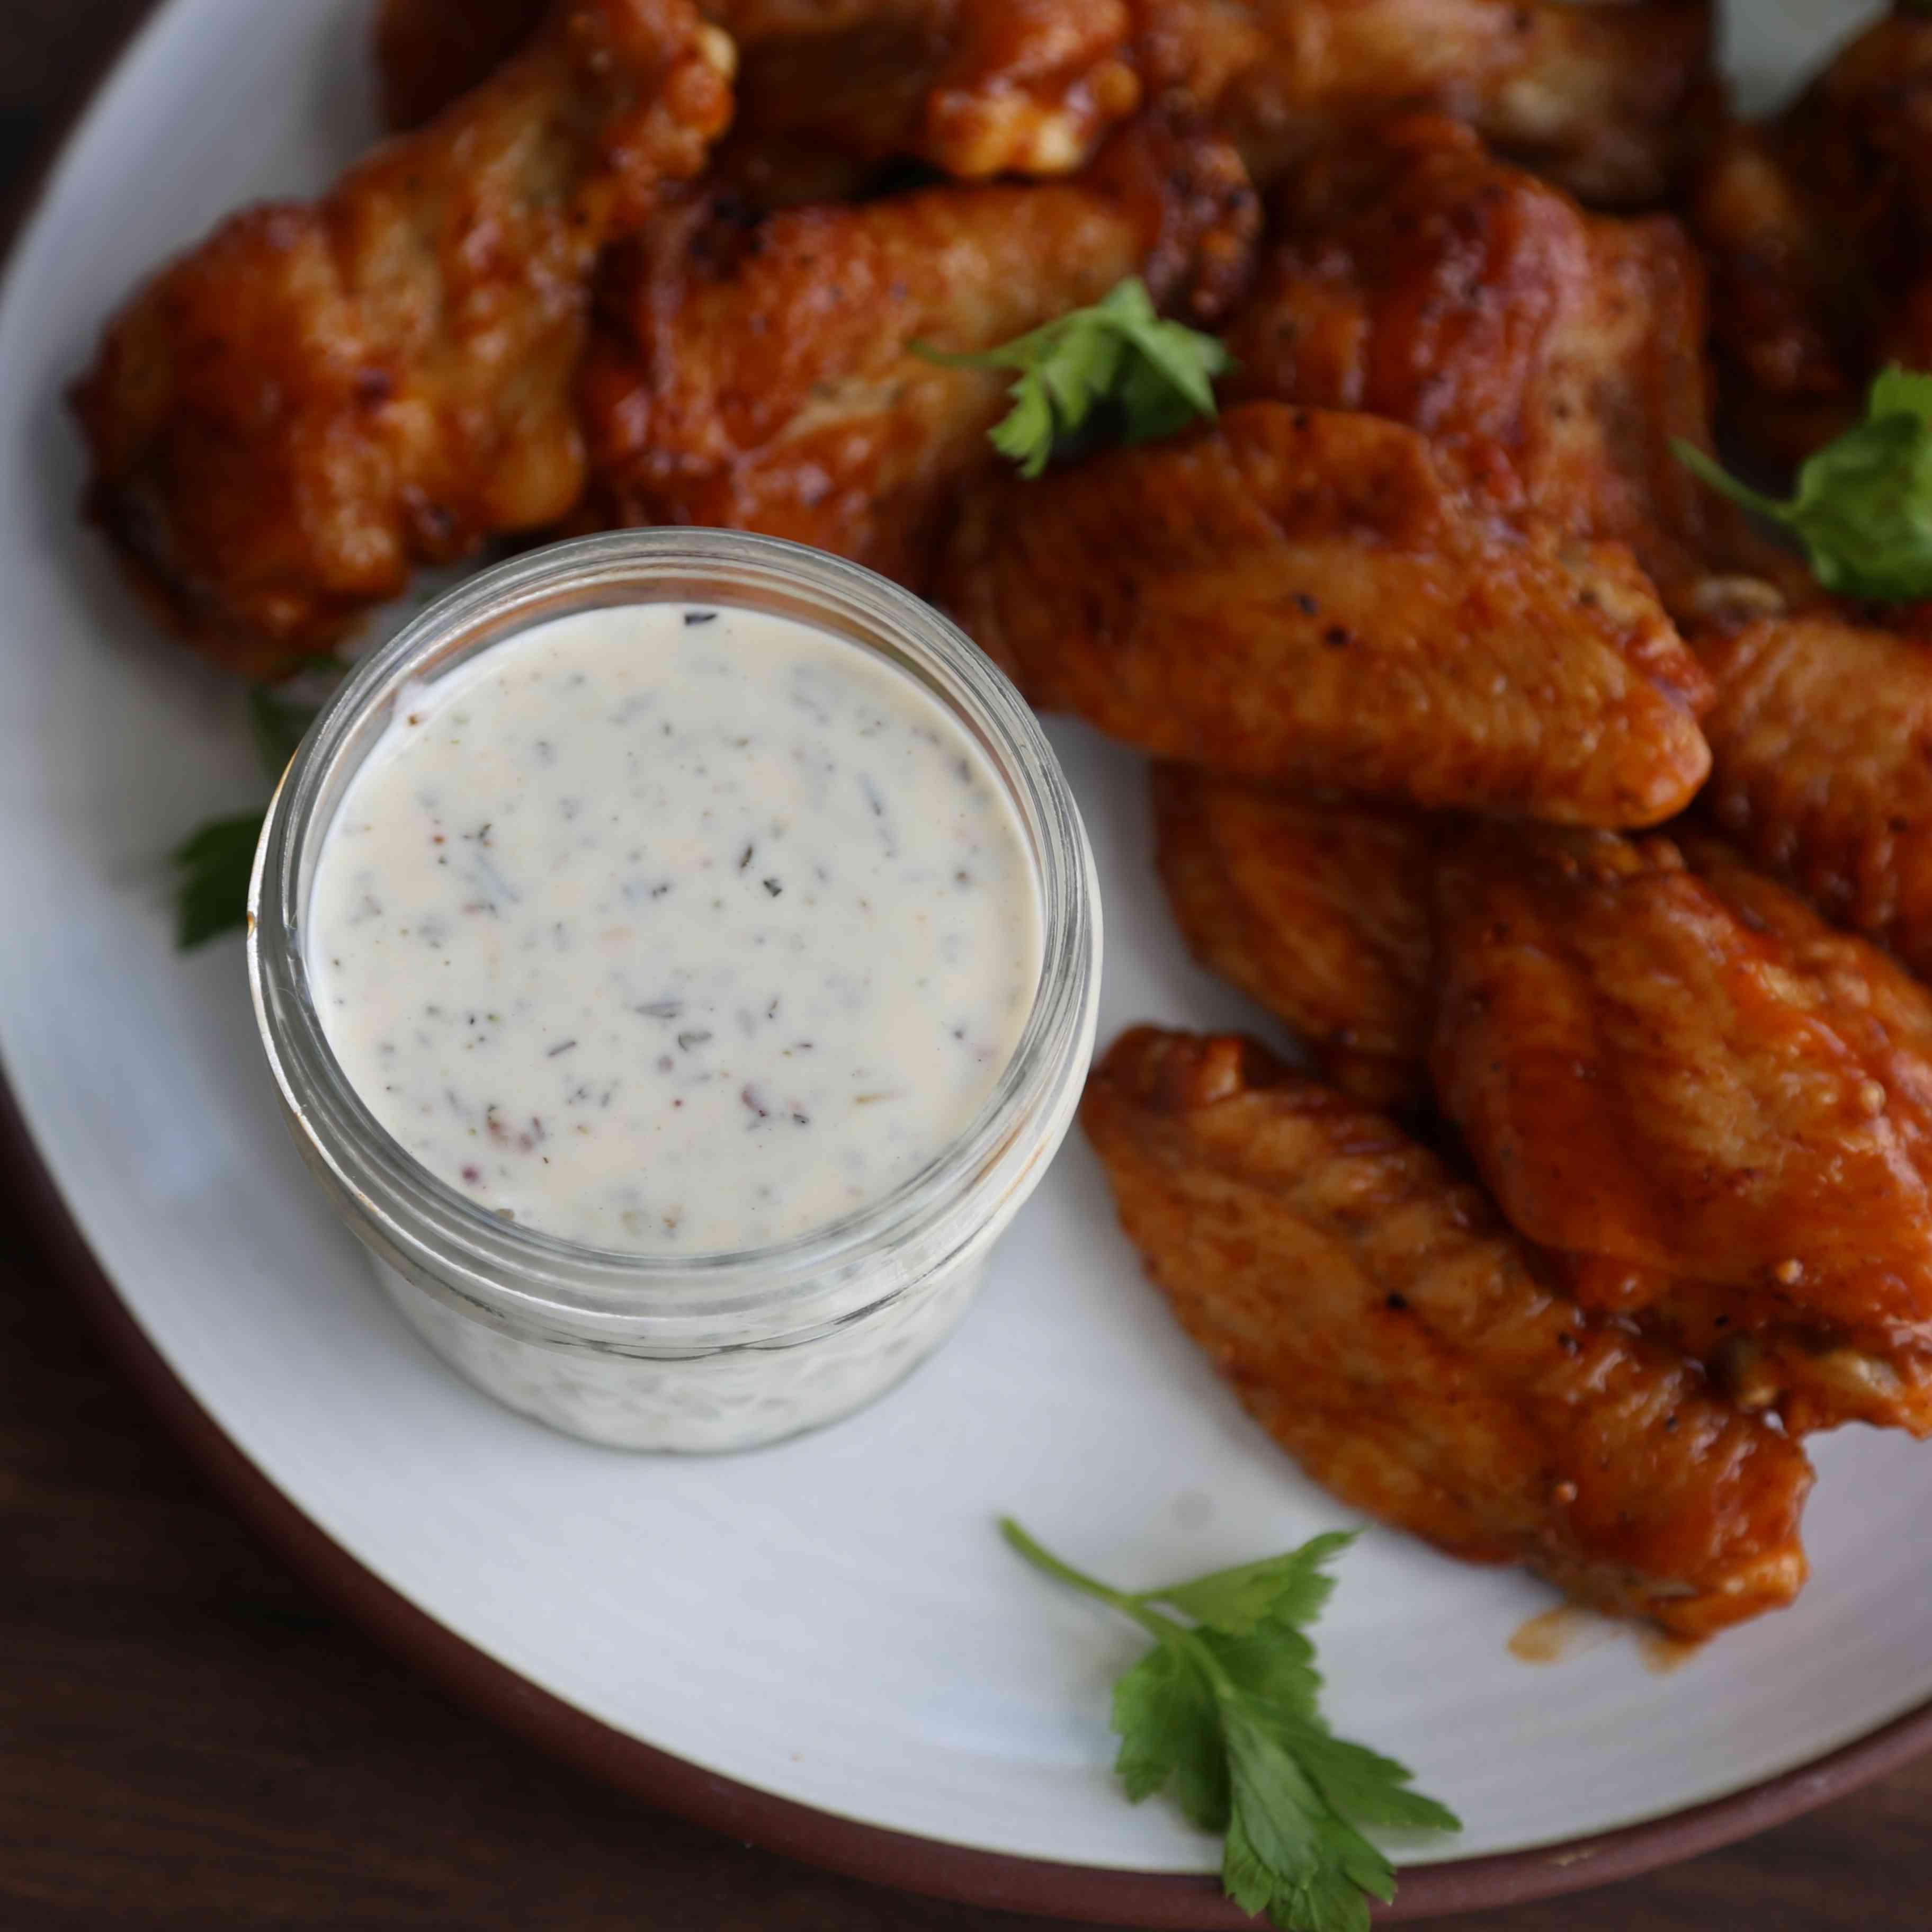 Buffalo Wild Wings-Style Garlic Parmesan Sauce